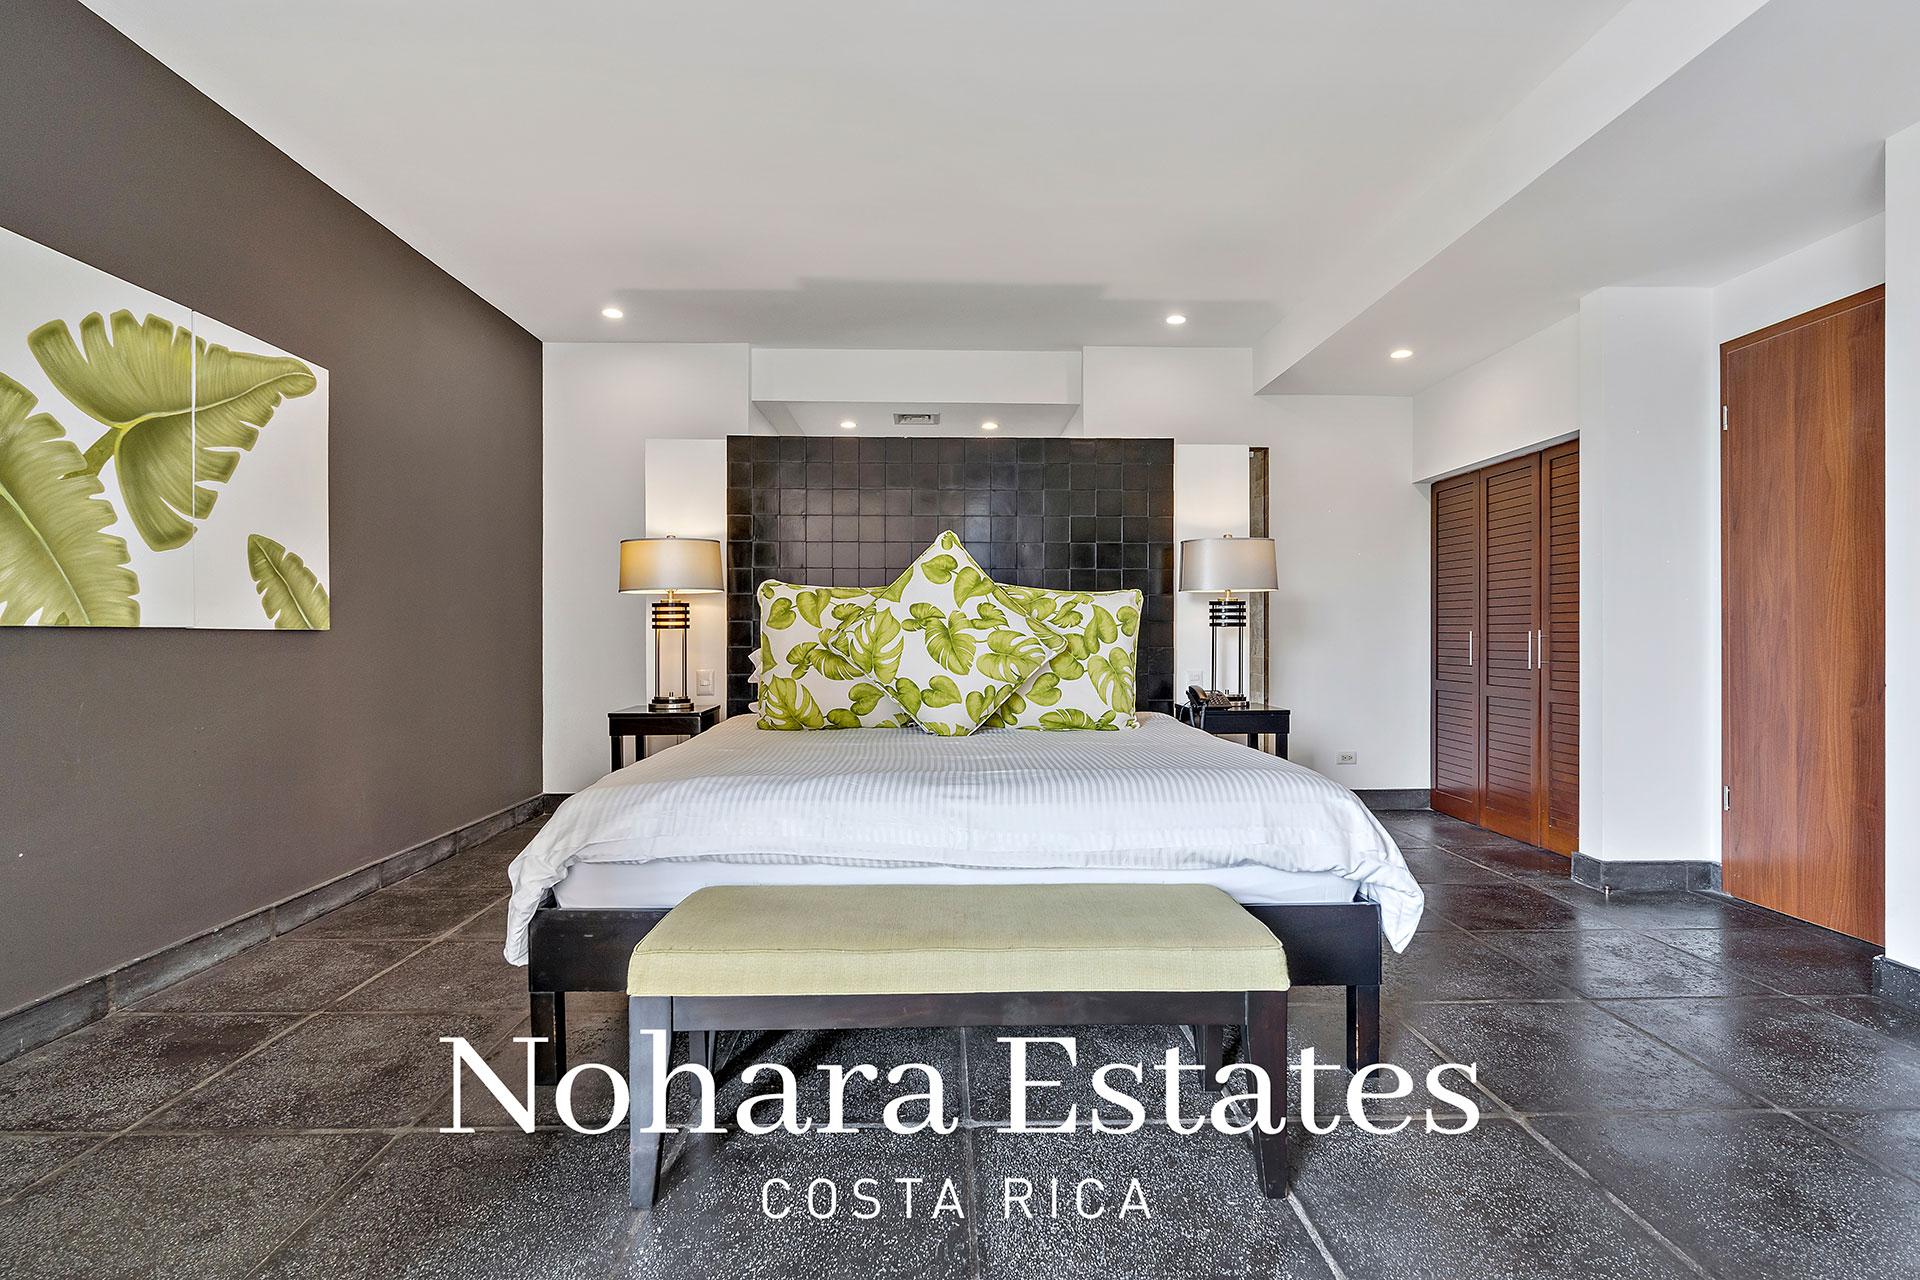 Nohara Estates Costa Rica 128 Penthouse Quepos Los Altos 10